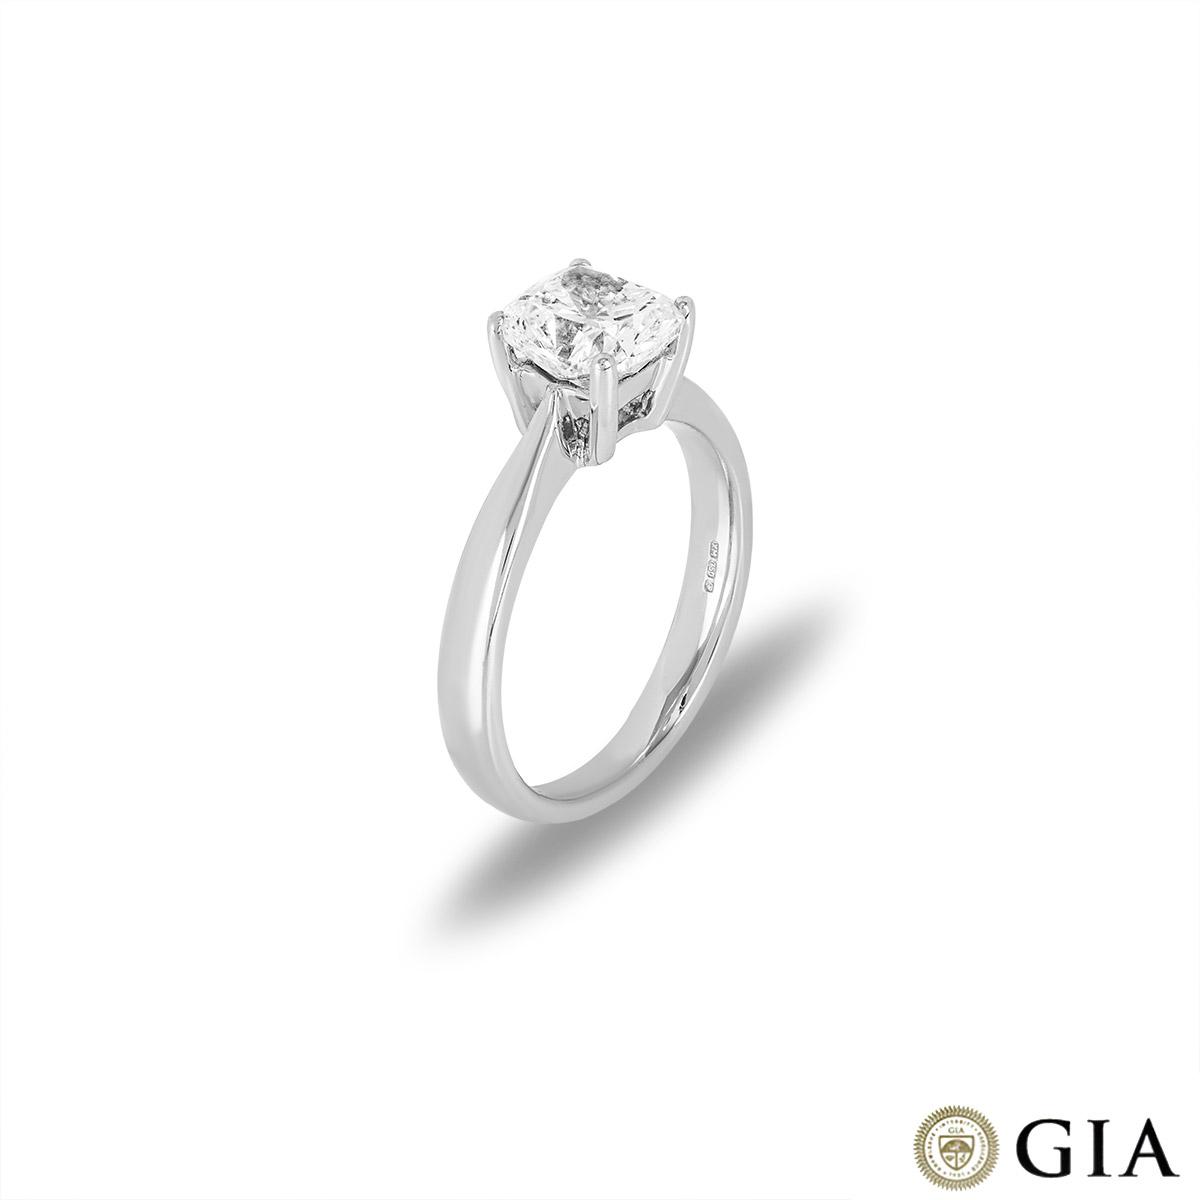 18k White Gold Cushion Cut Diamond Ring 1.66ct I/VS1